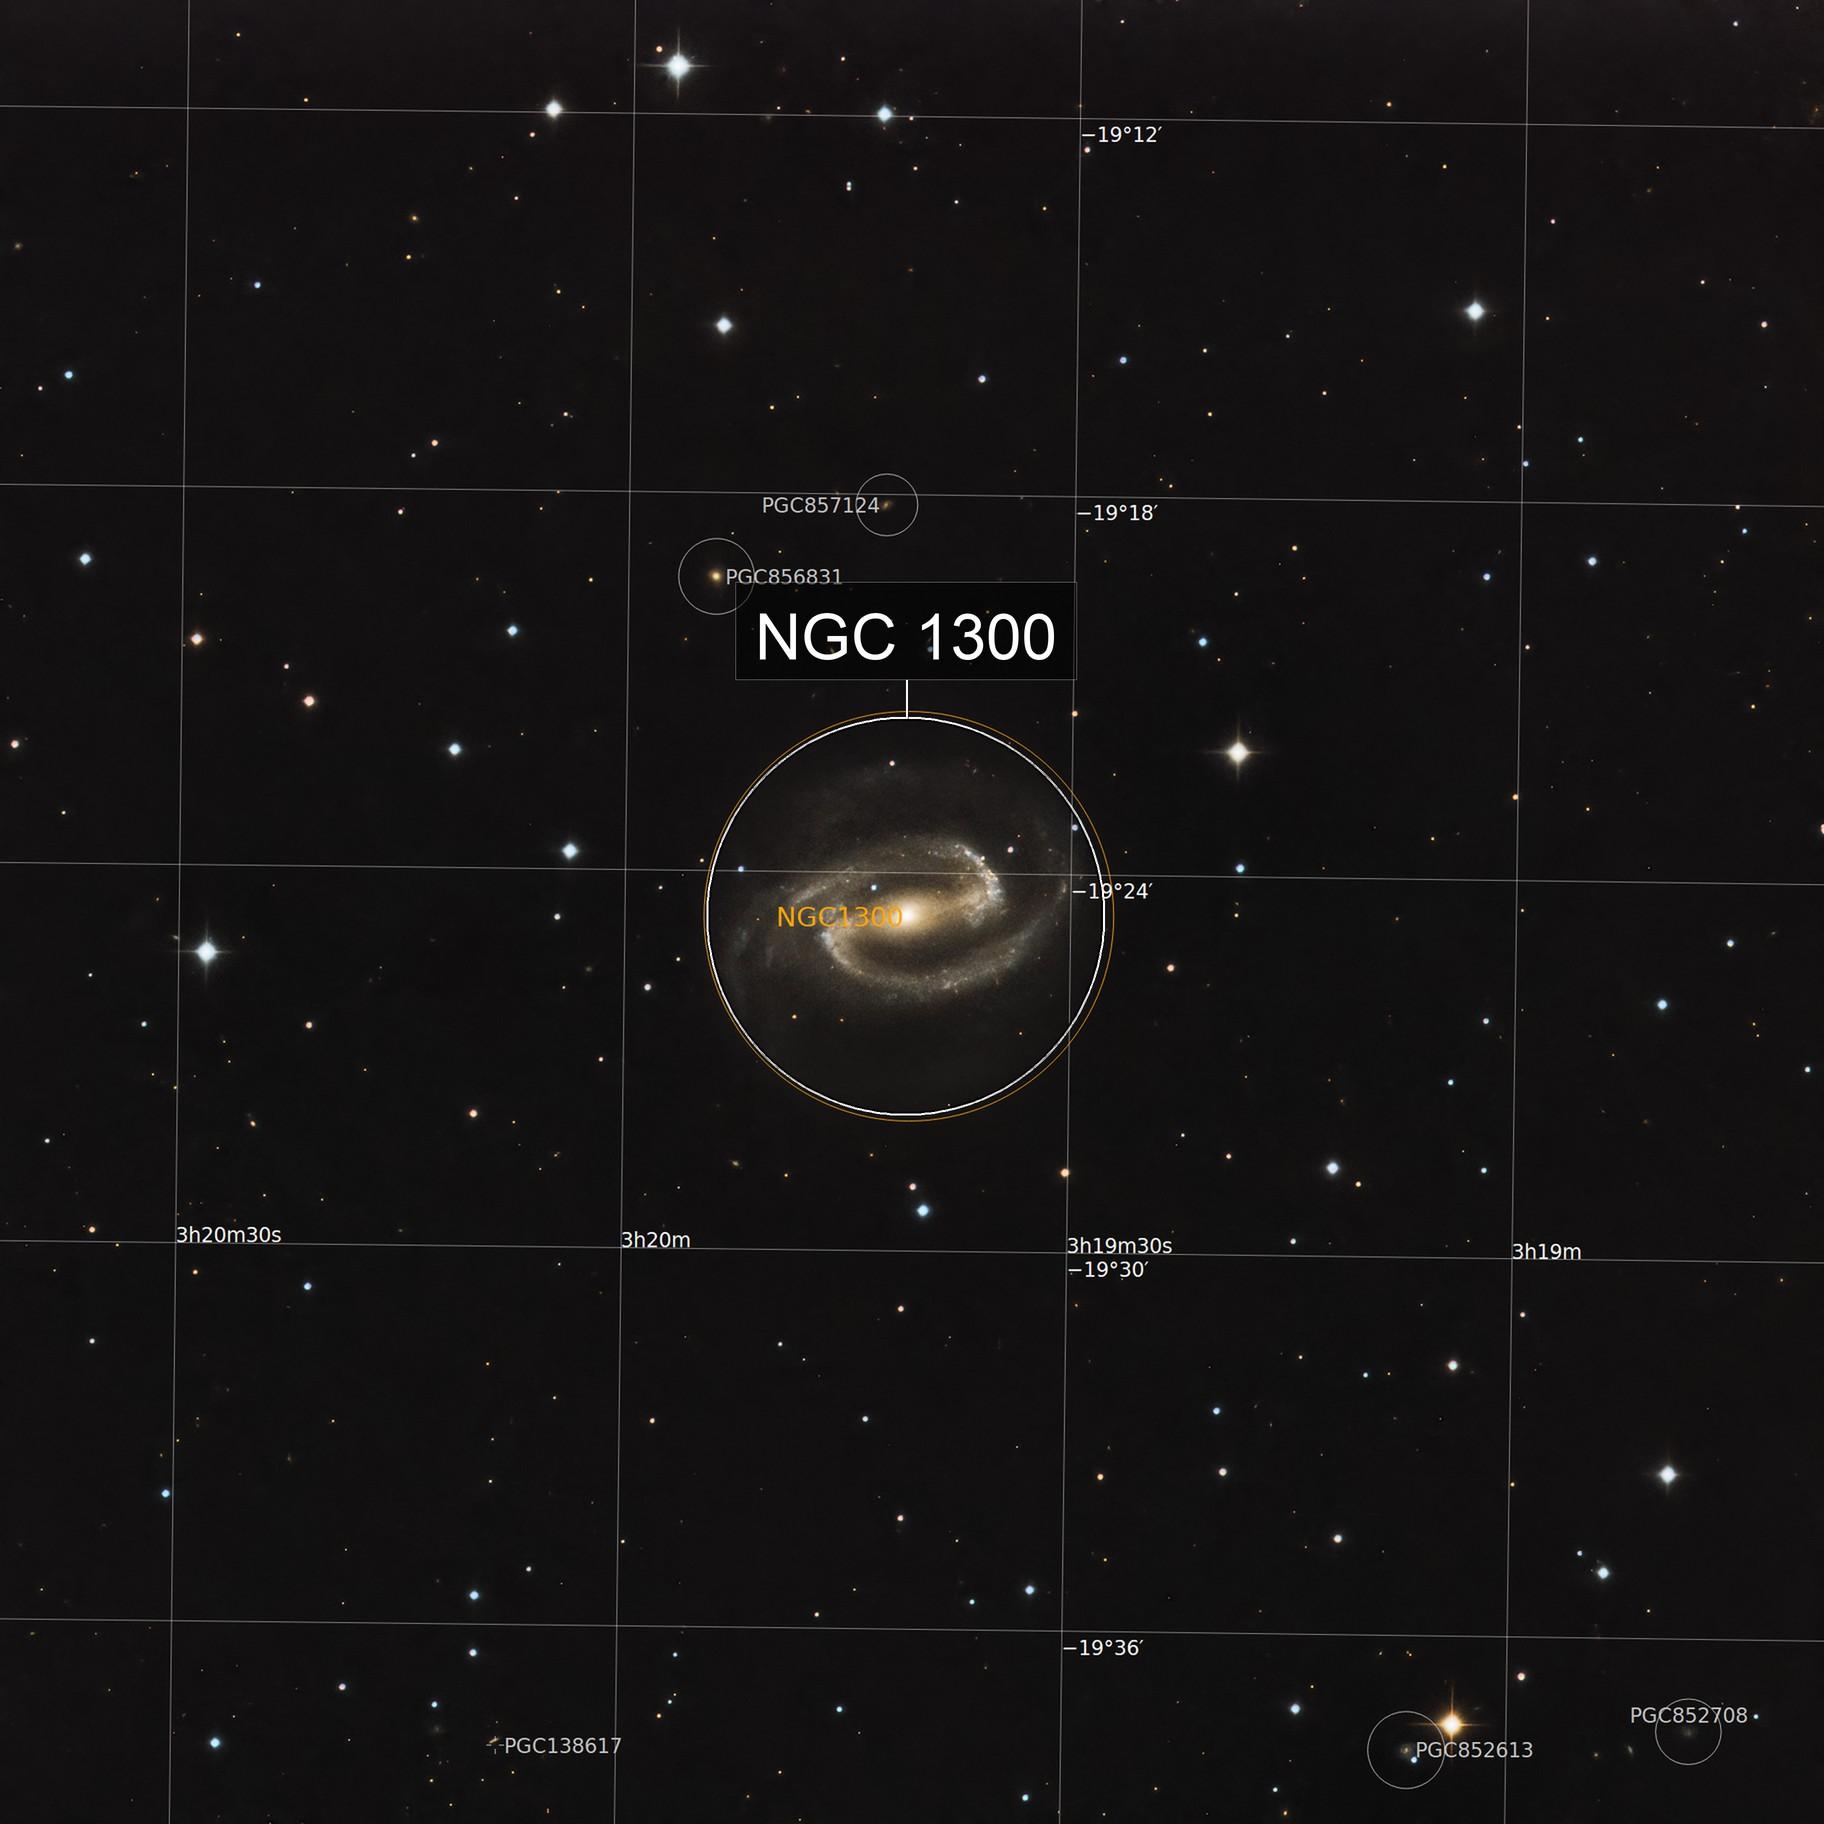 NGC 1300 Barred Spiral Galaxy 20210206 3600s RGB 01.5.2